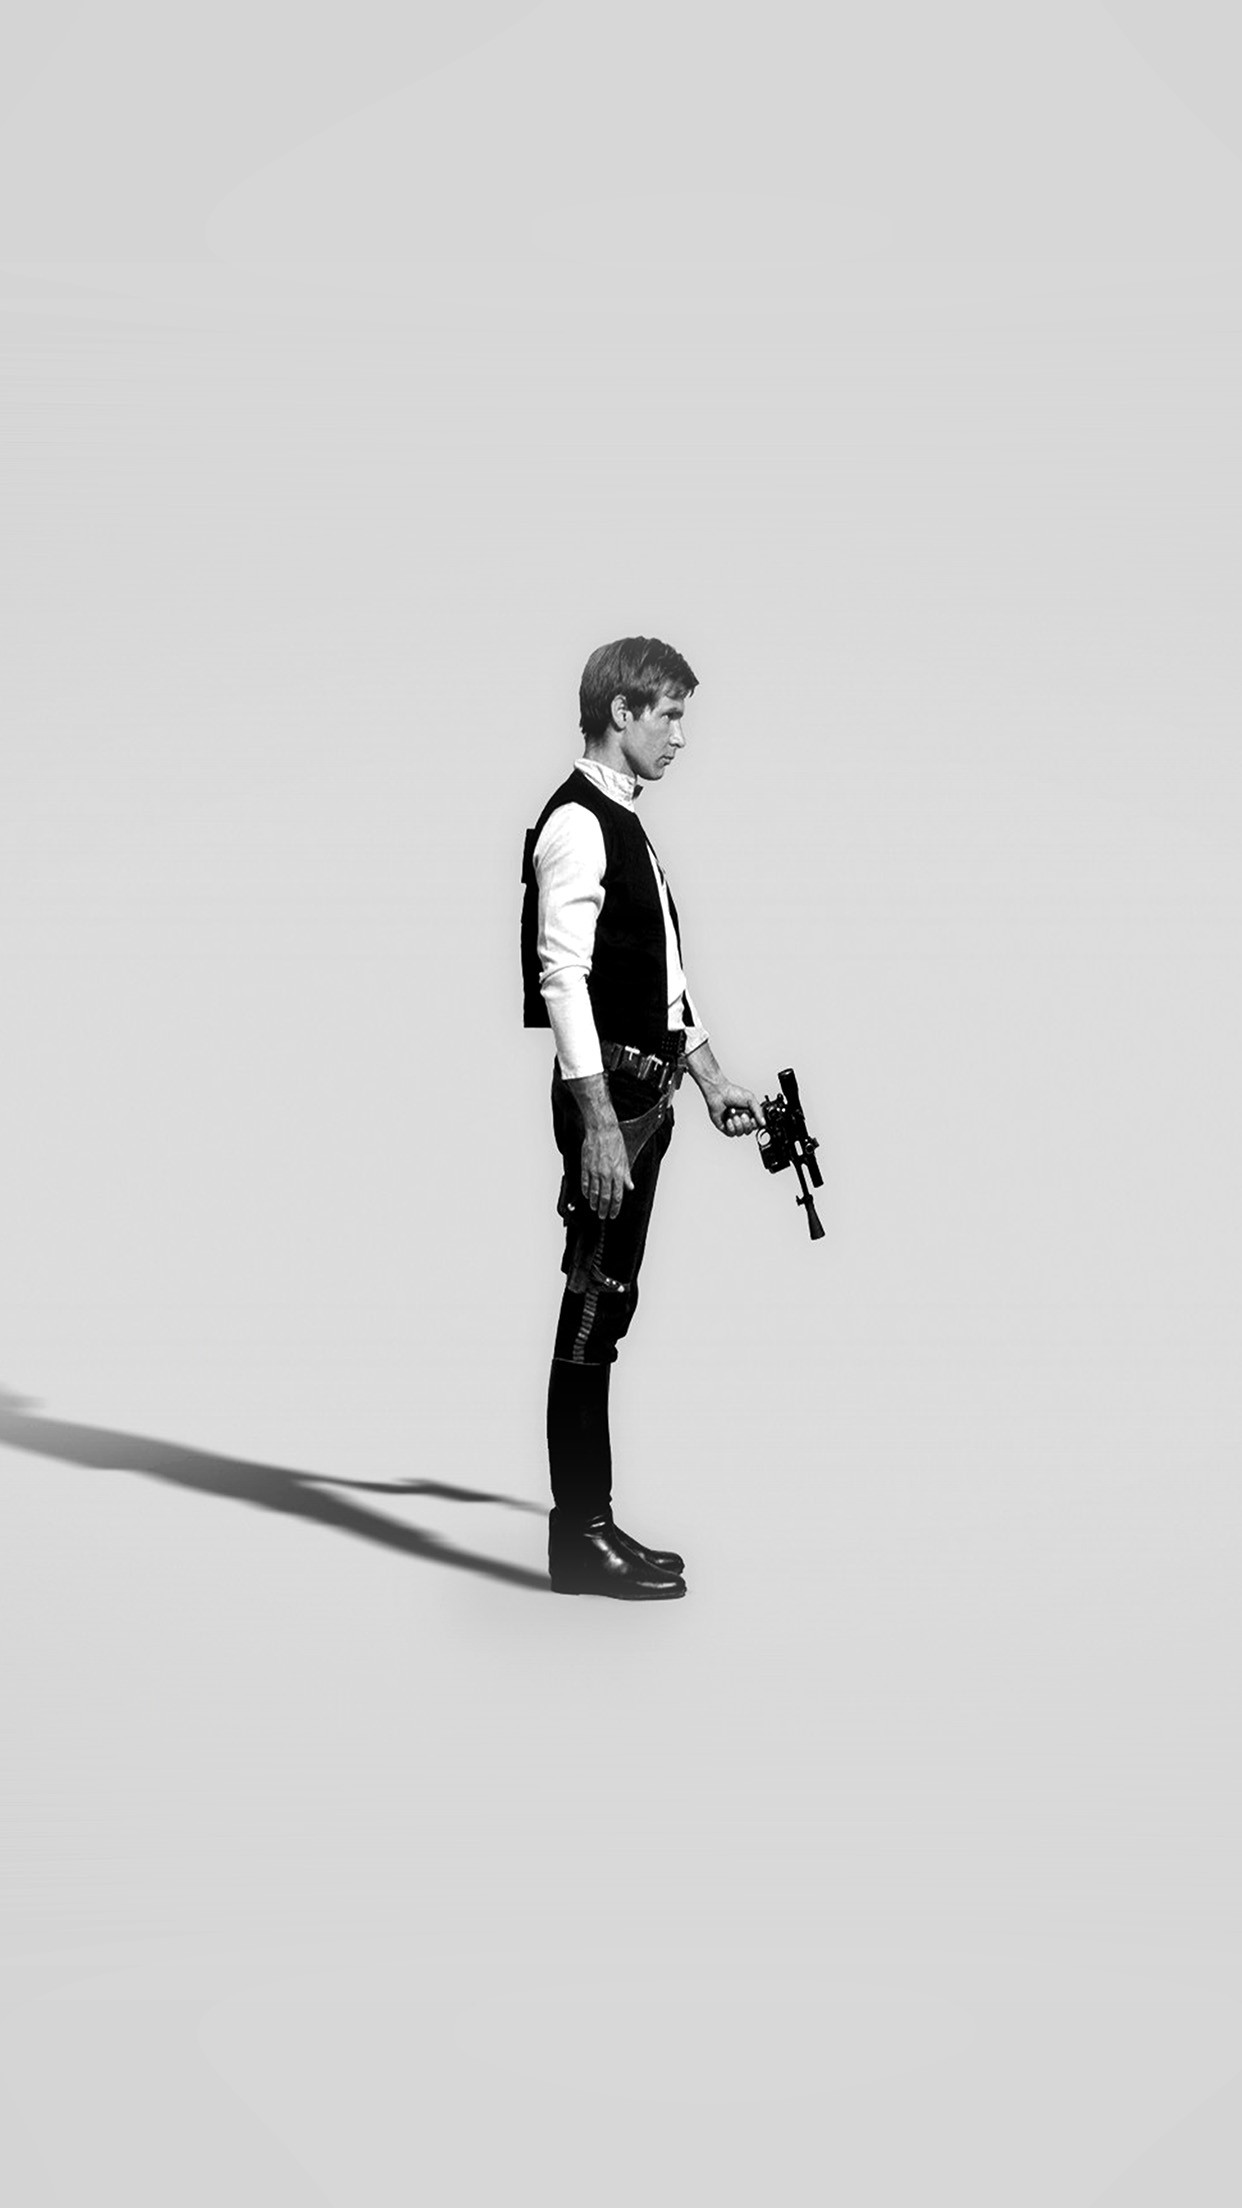 Han Solo Starwars Hero Art Minimal Bw